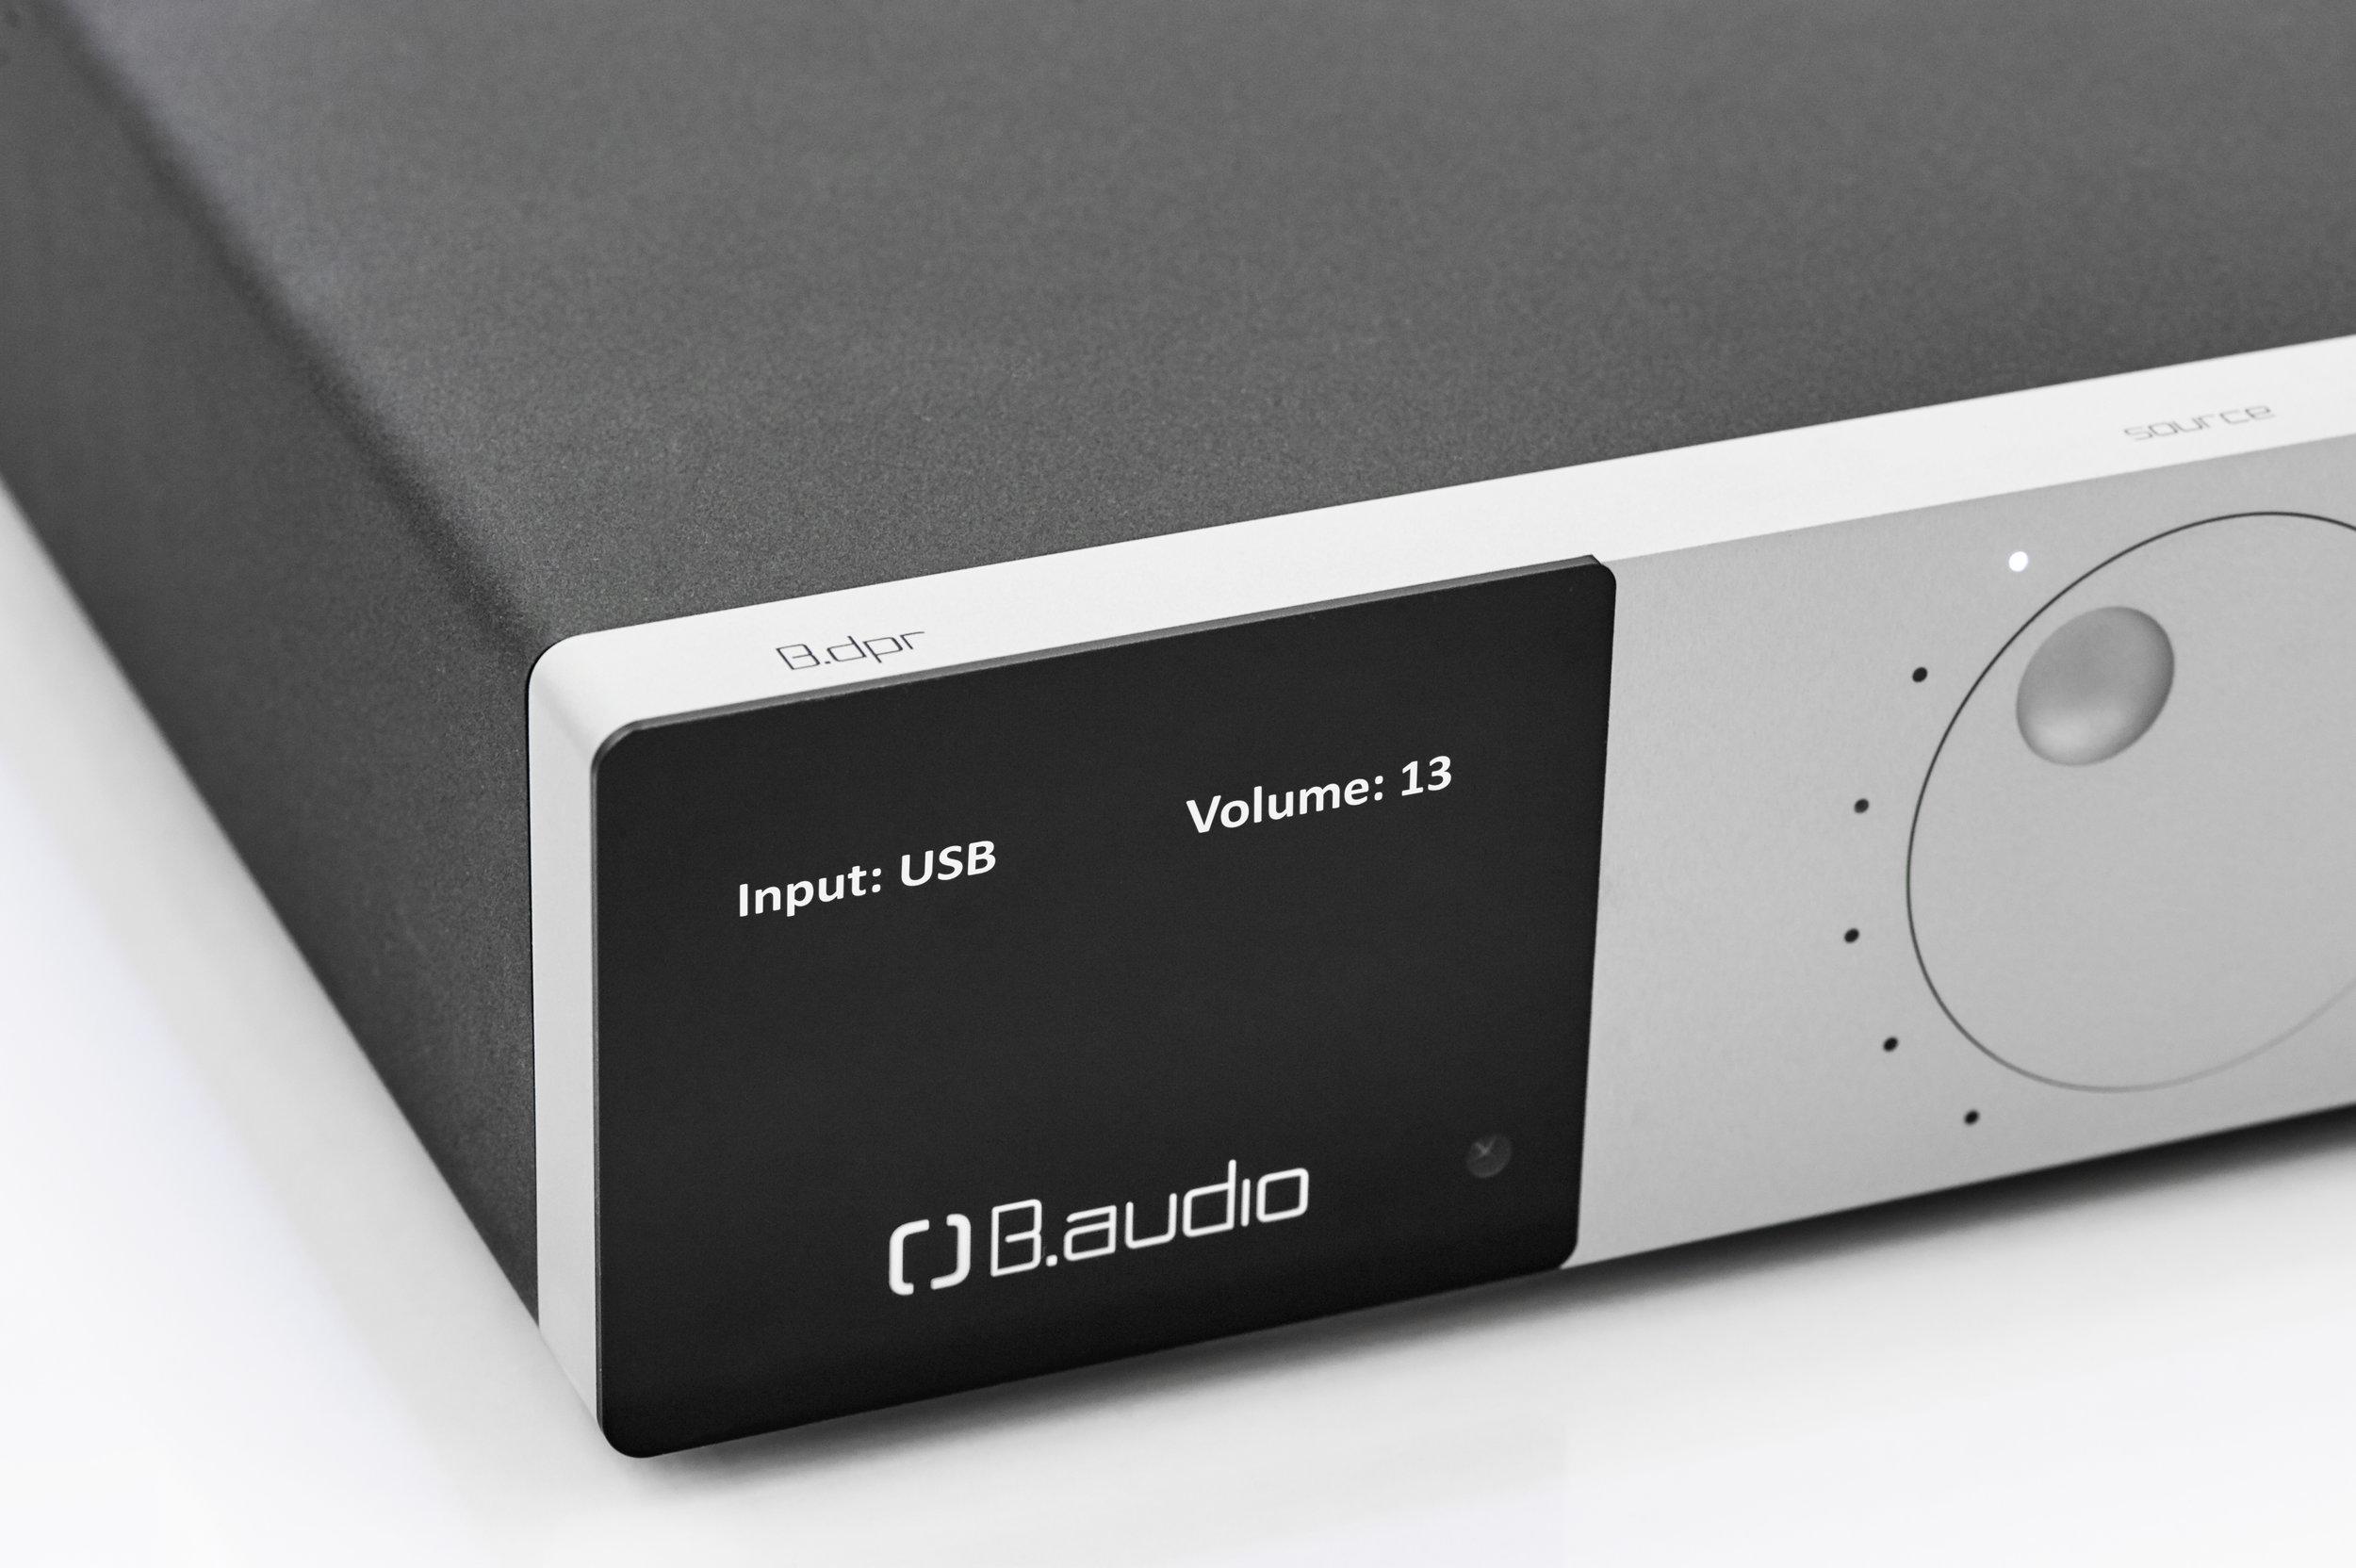 b audio00007.jpg